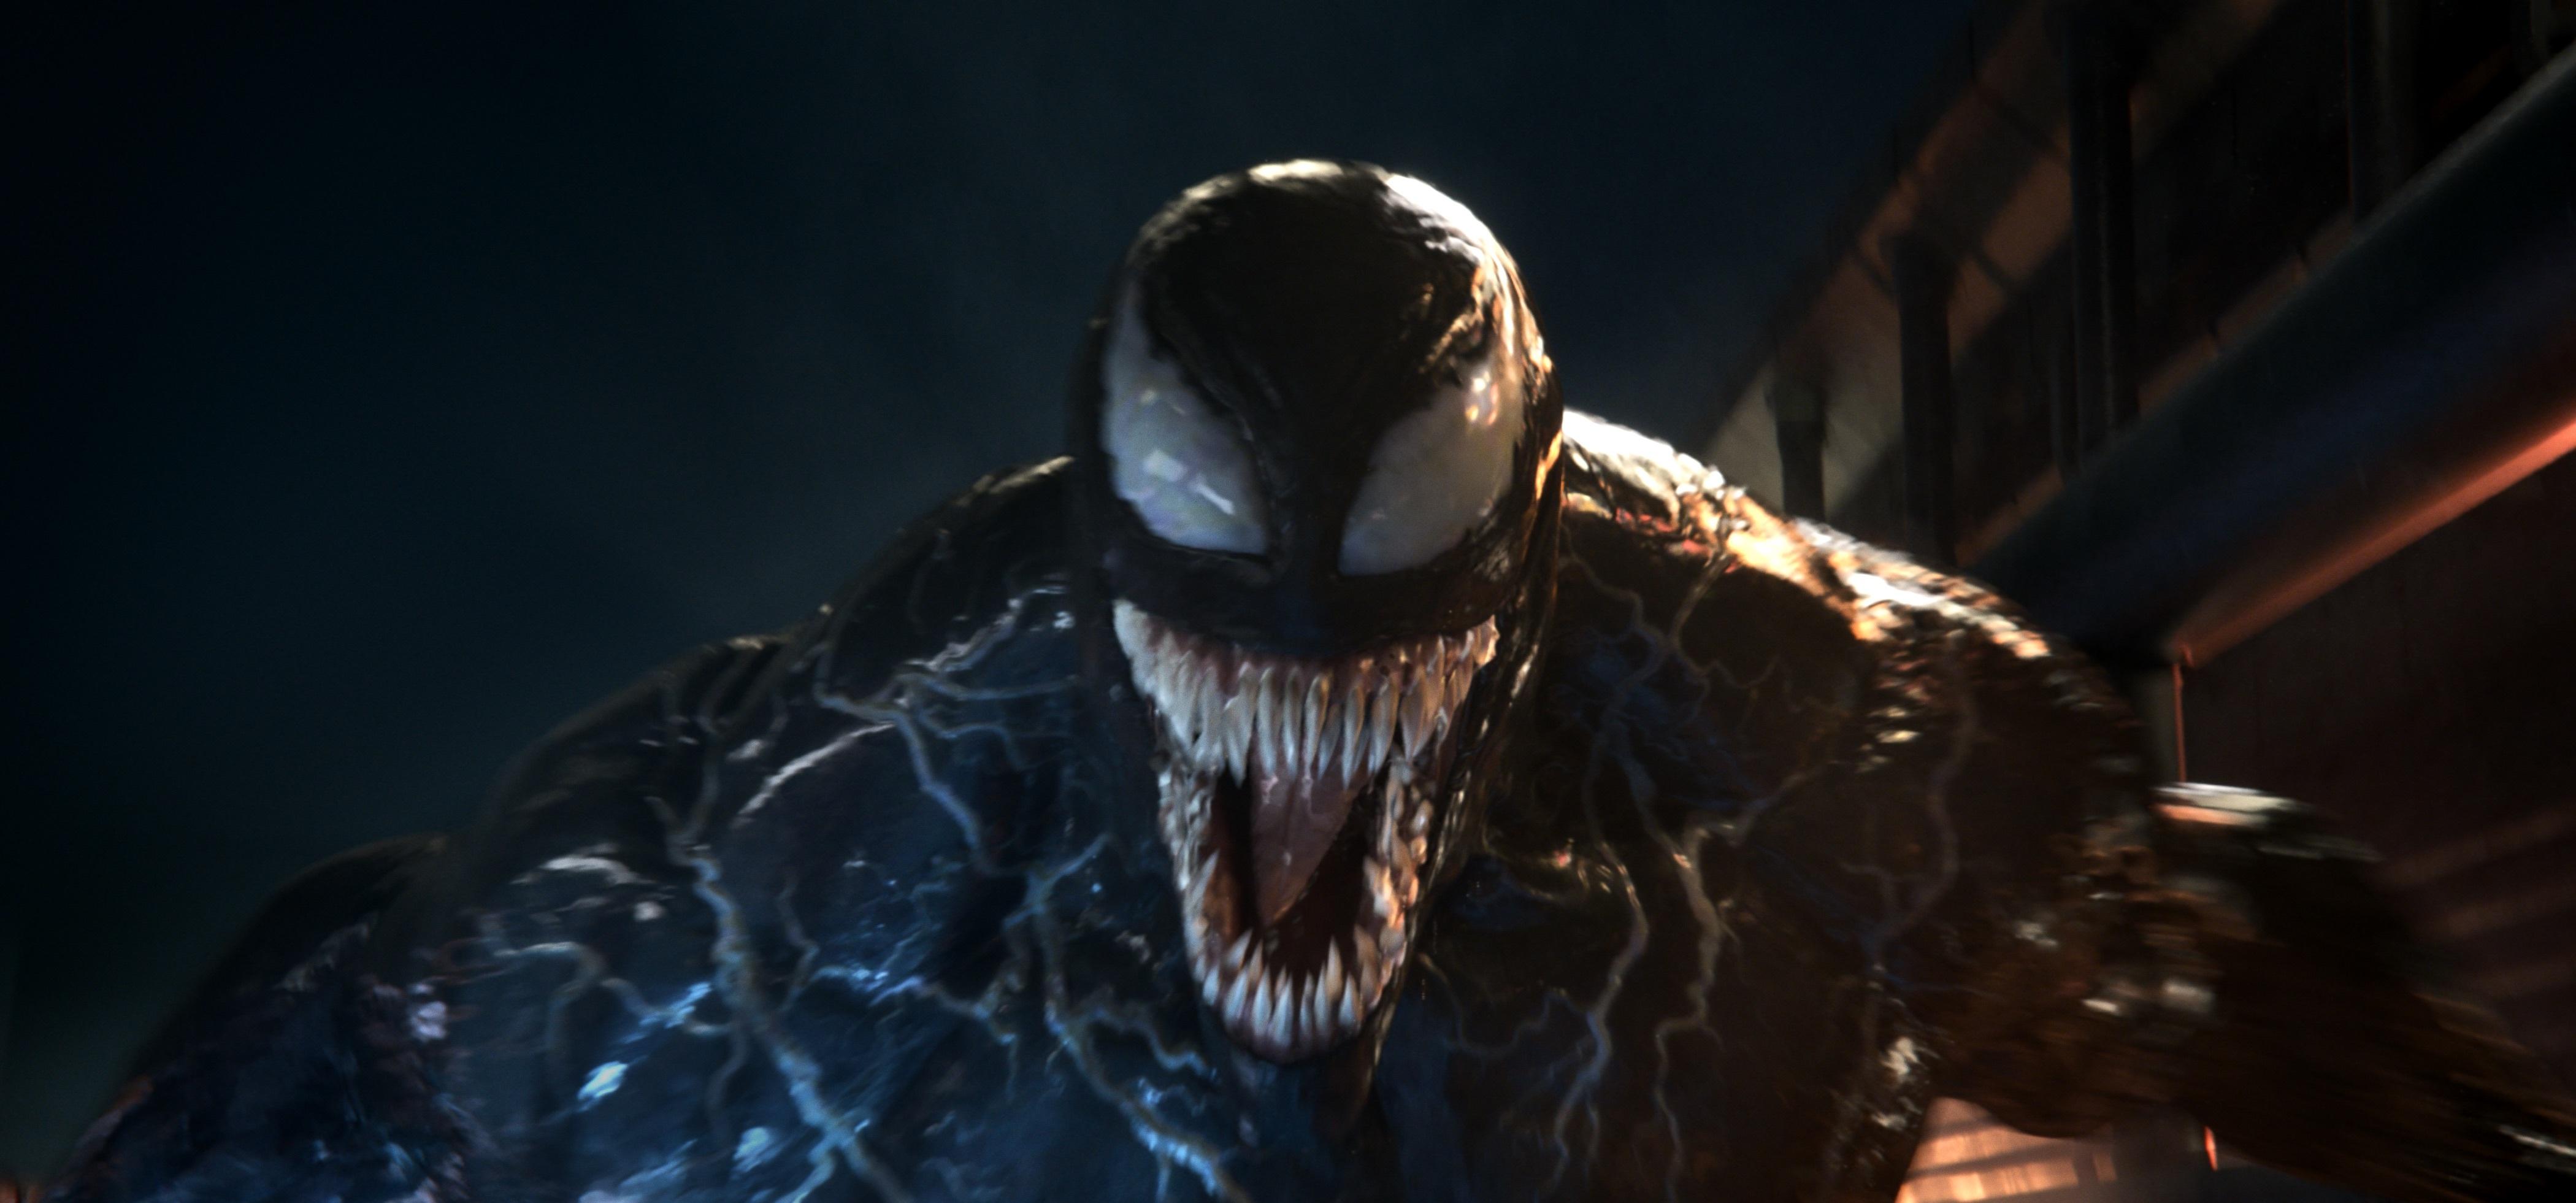 """Venom"" tells the story of Eddie Brock becoming the villain Venom."